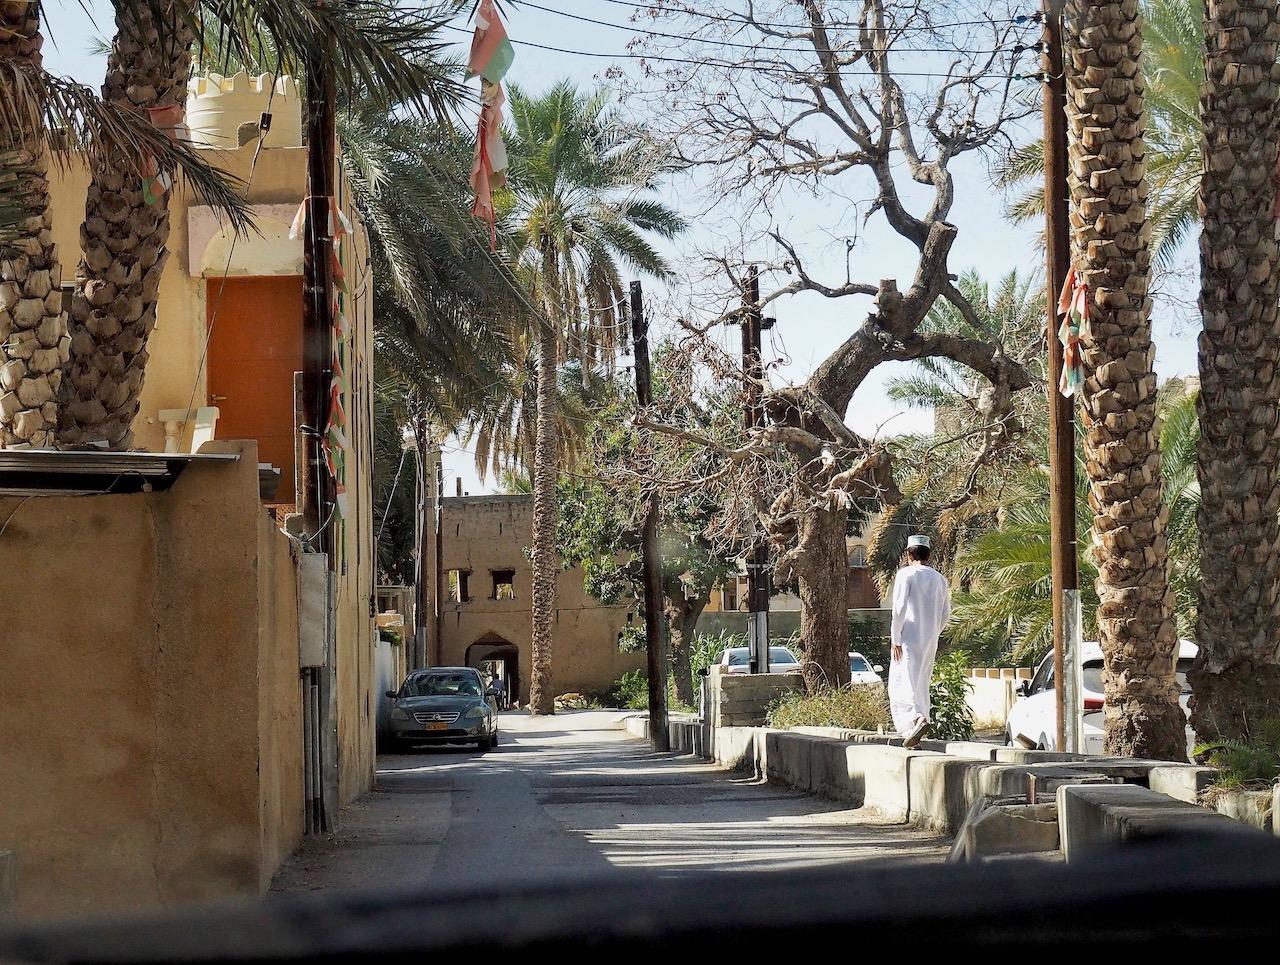 Voyage à Oman, dans les rues étroites de Birkat Al Mawz